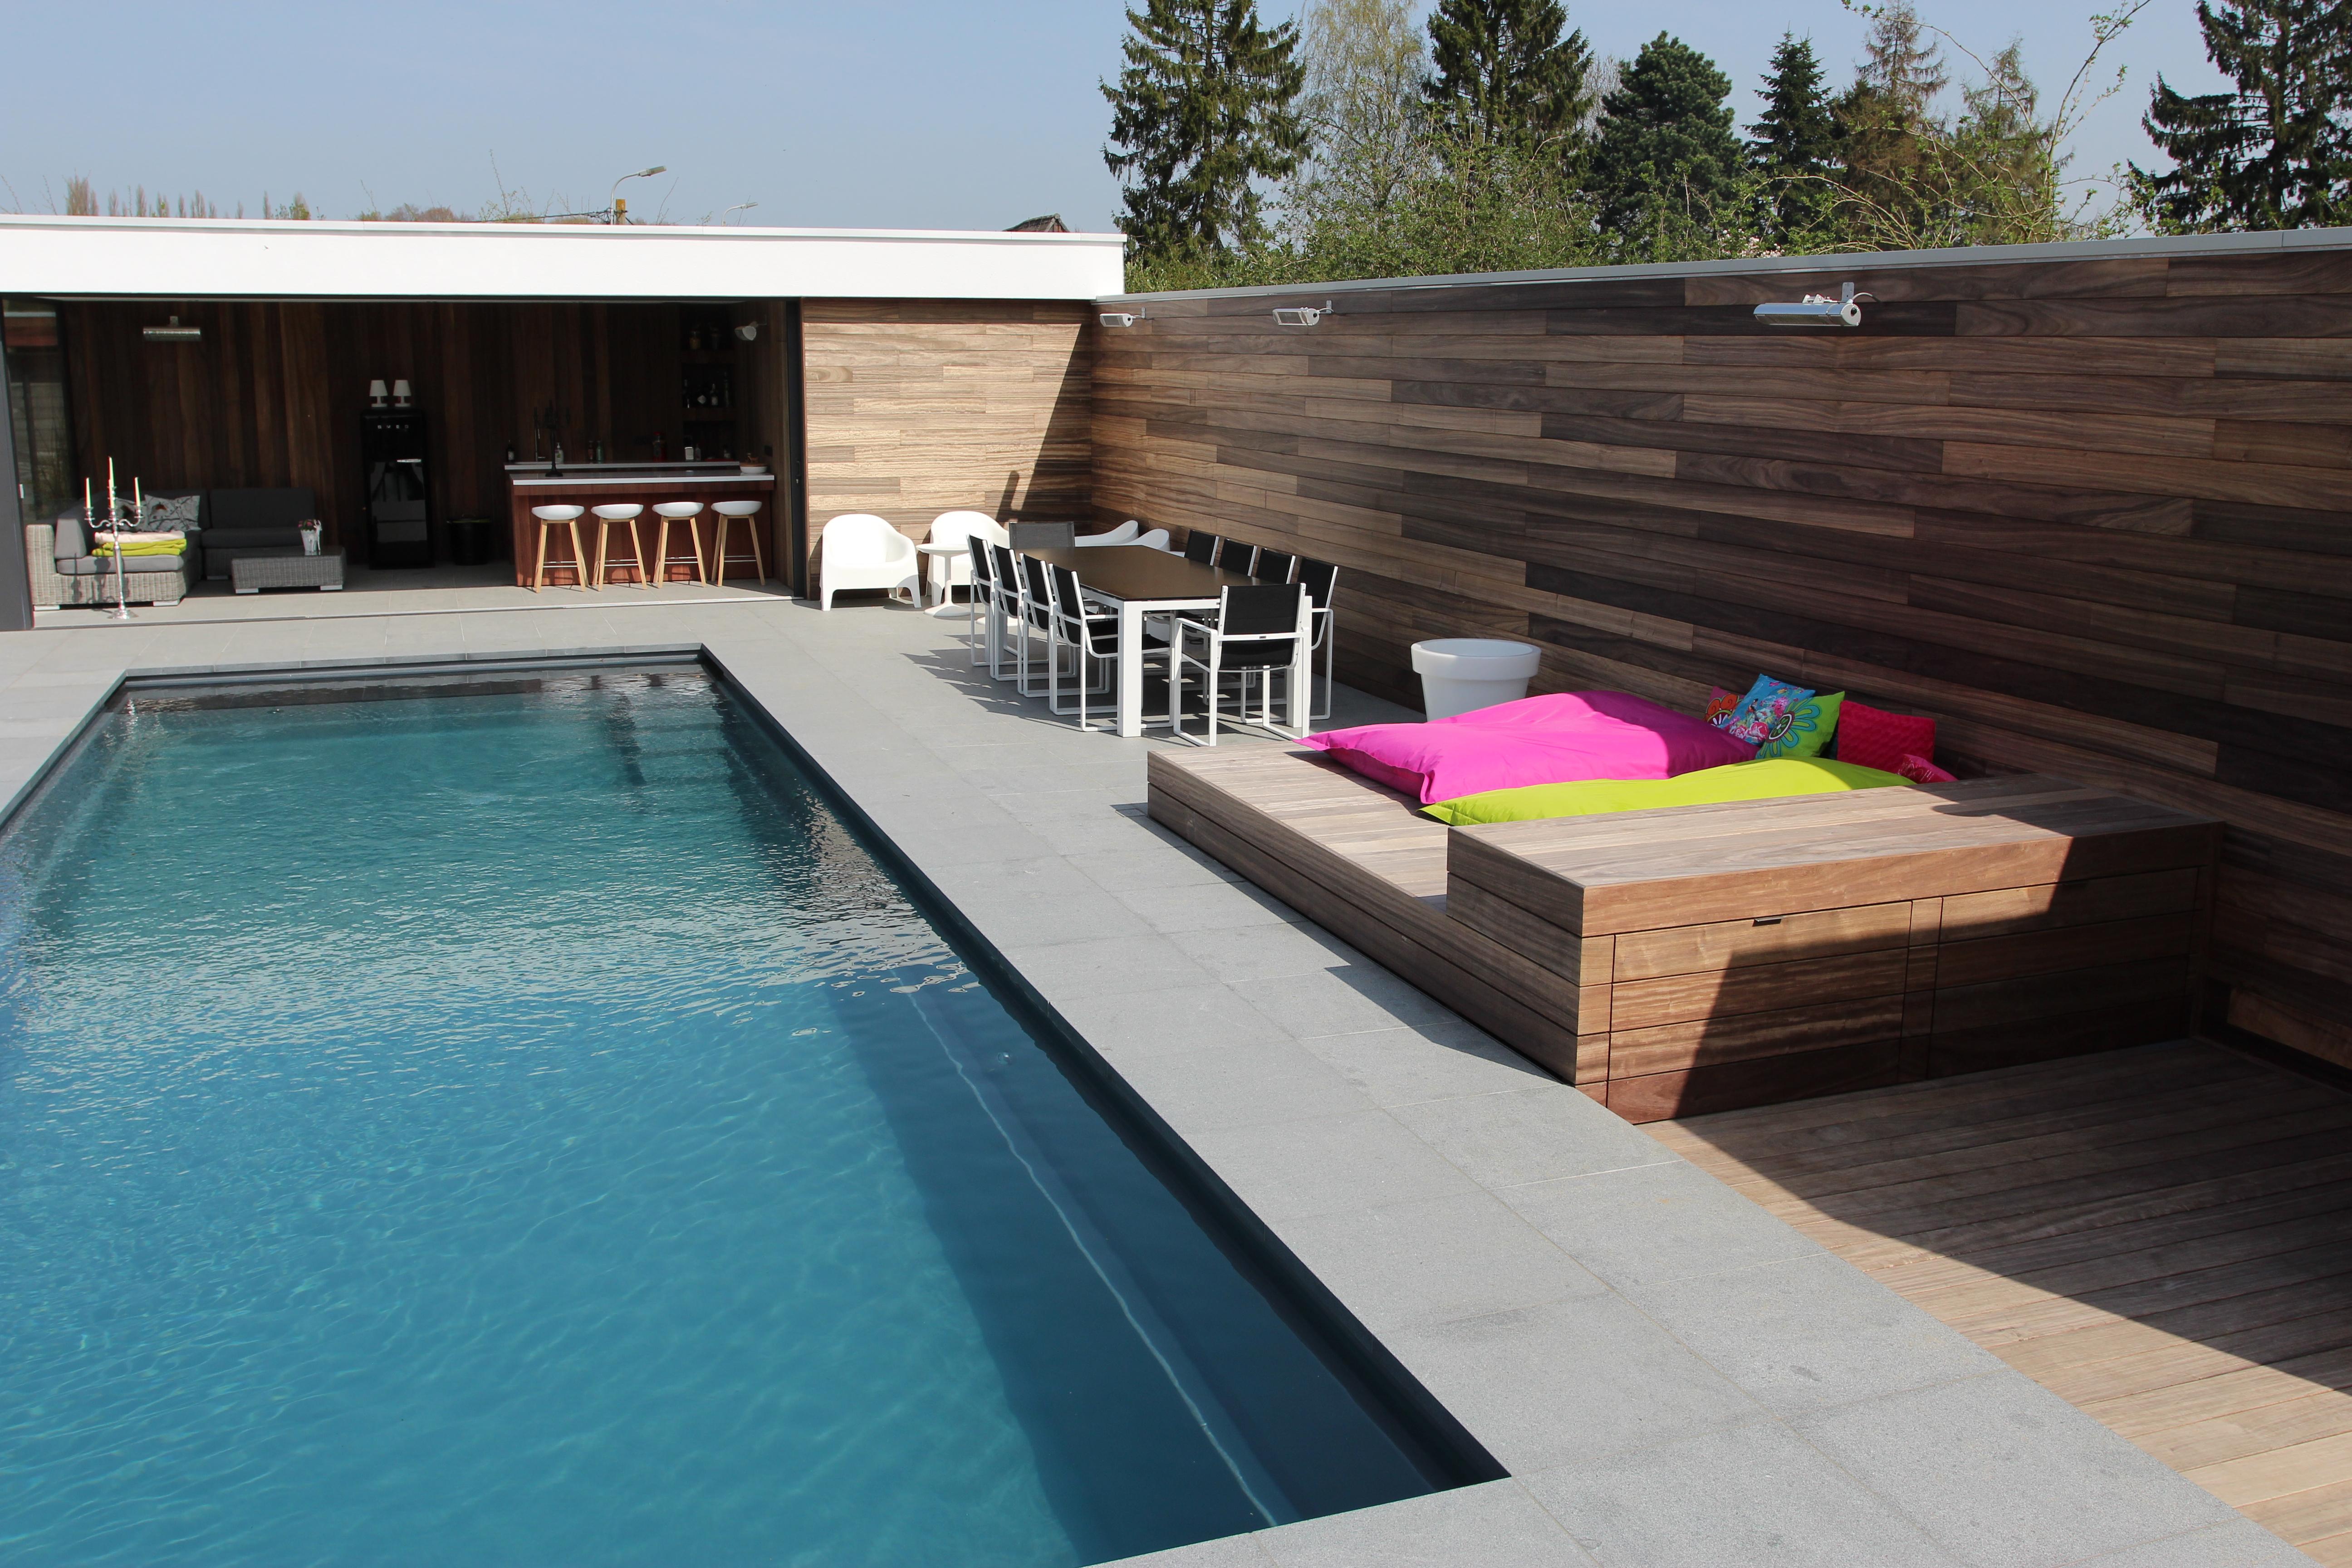 Leisure pools construction piscines - Piscine leisure pools ...